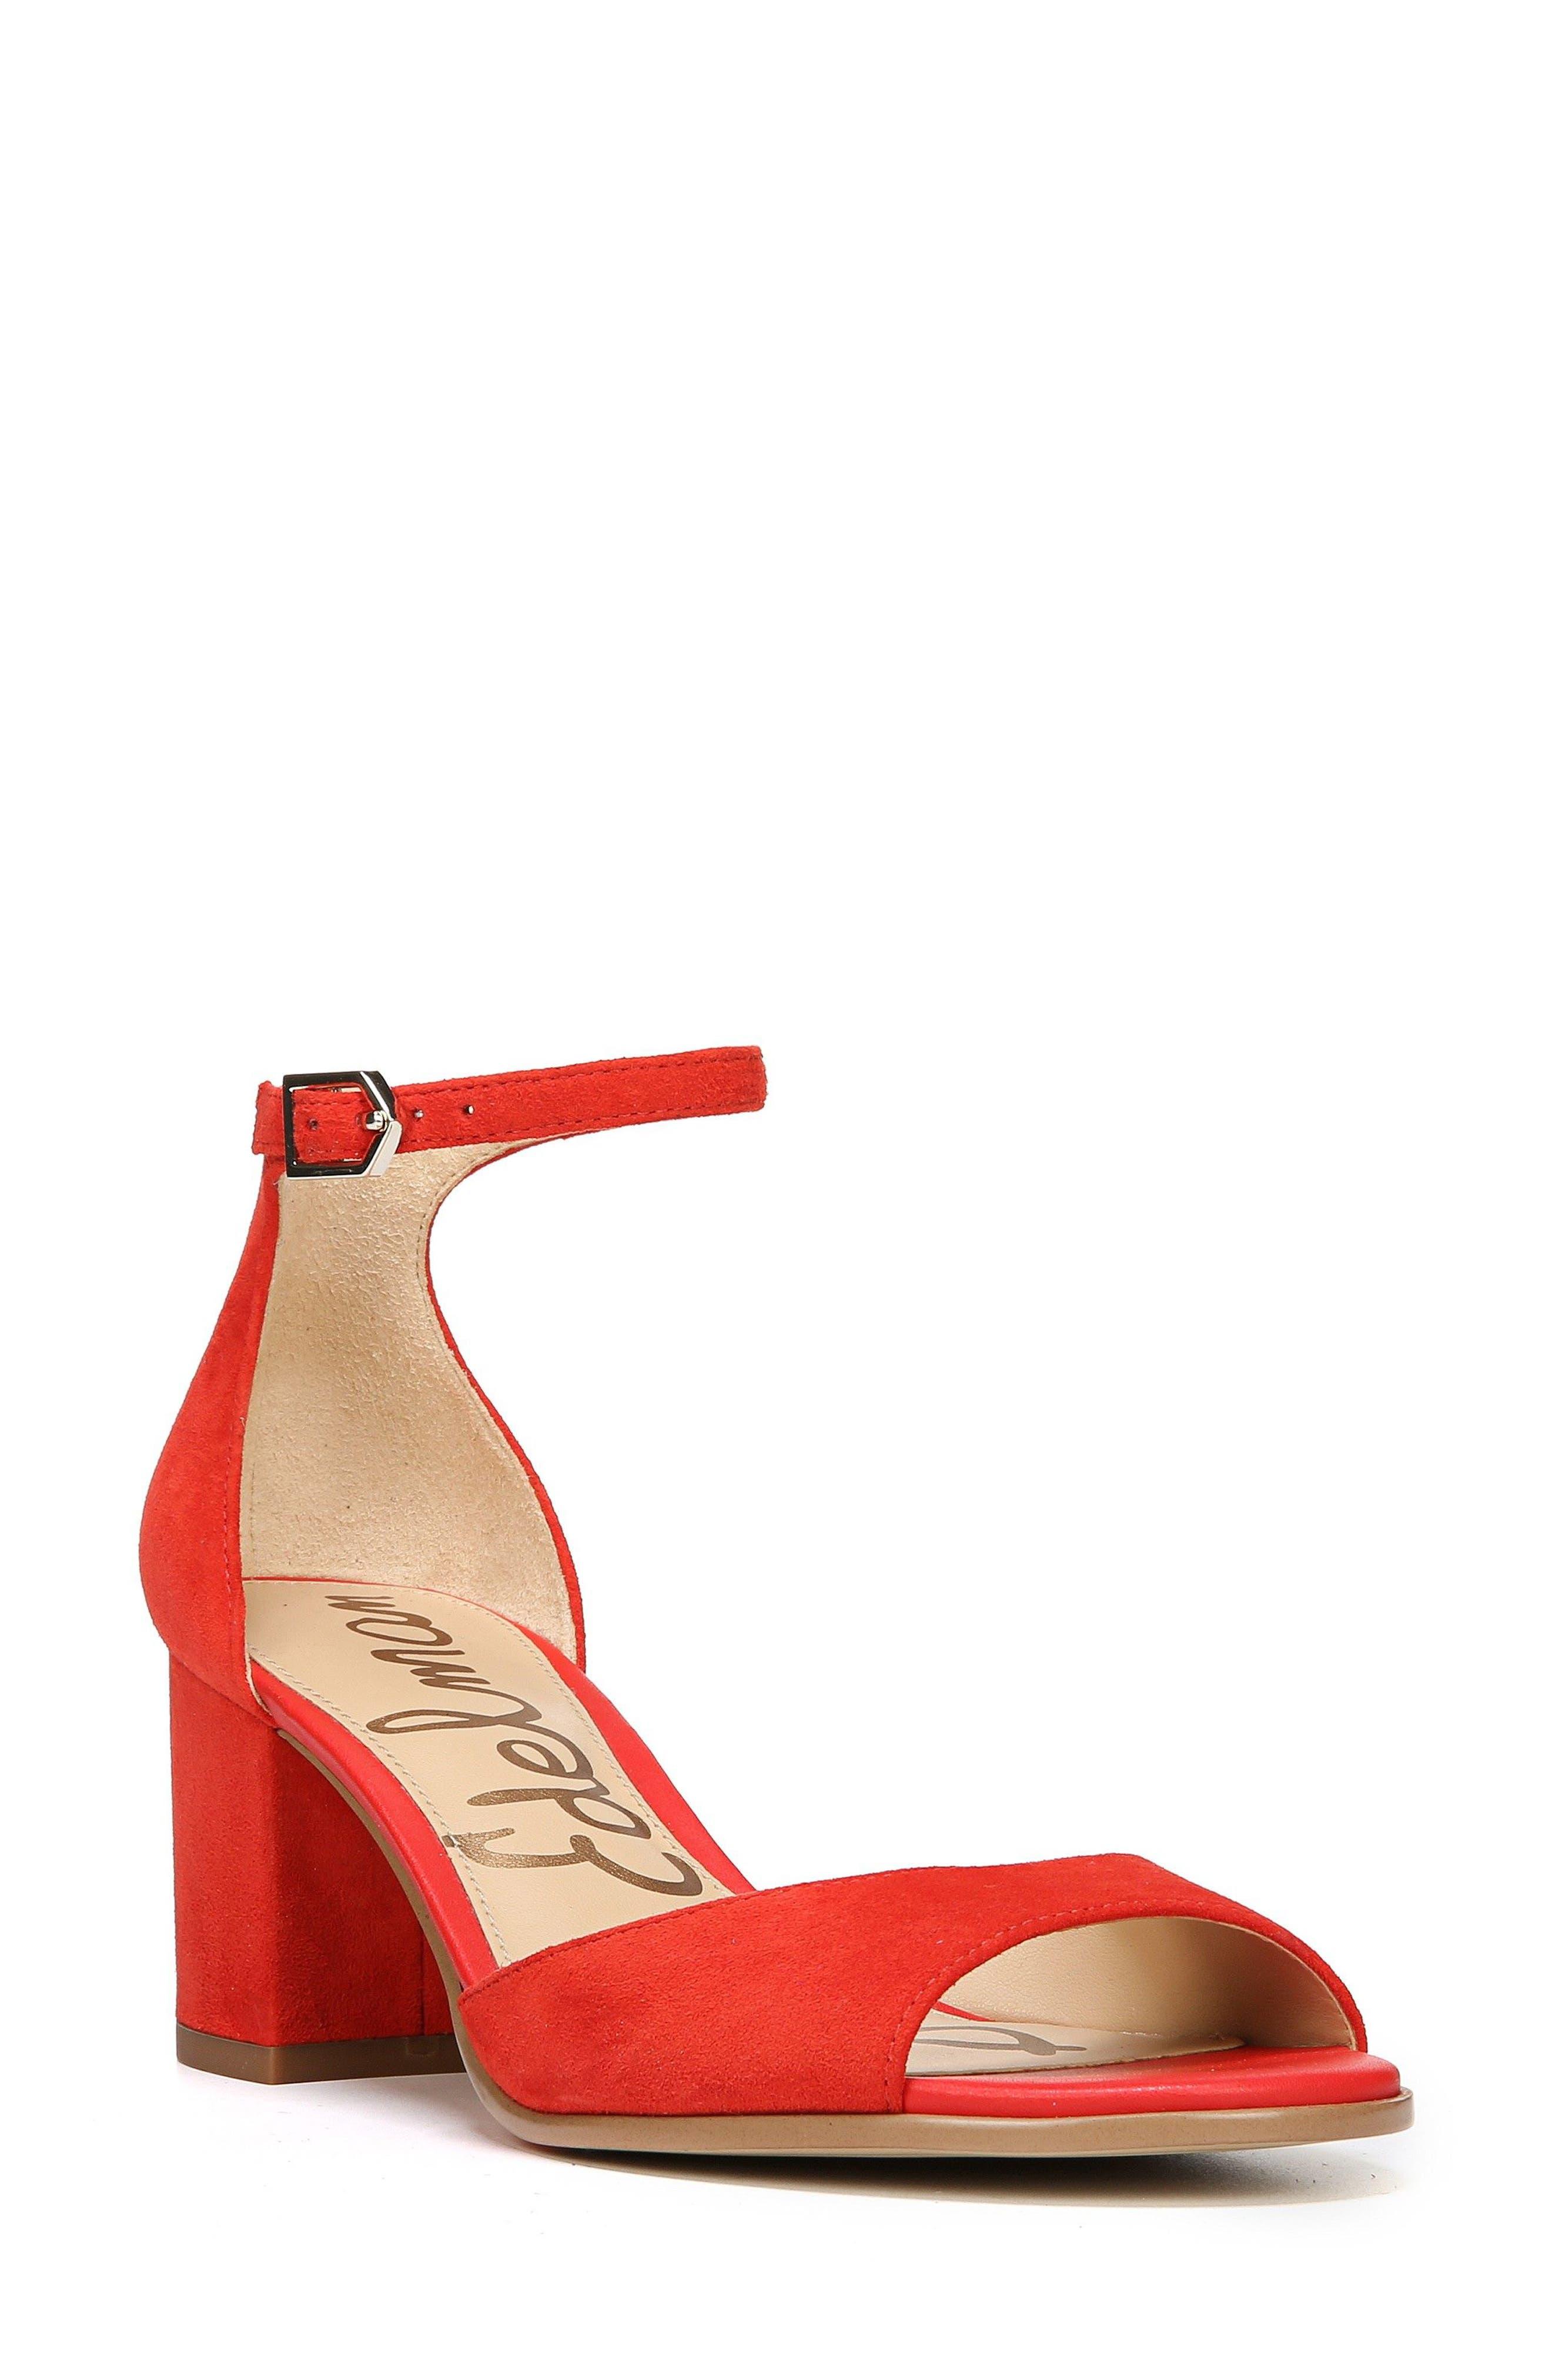 Alternate Image 1 Selected - Sam Edelman Susie d'Orsay Ankle Strap Sandal (Women)